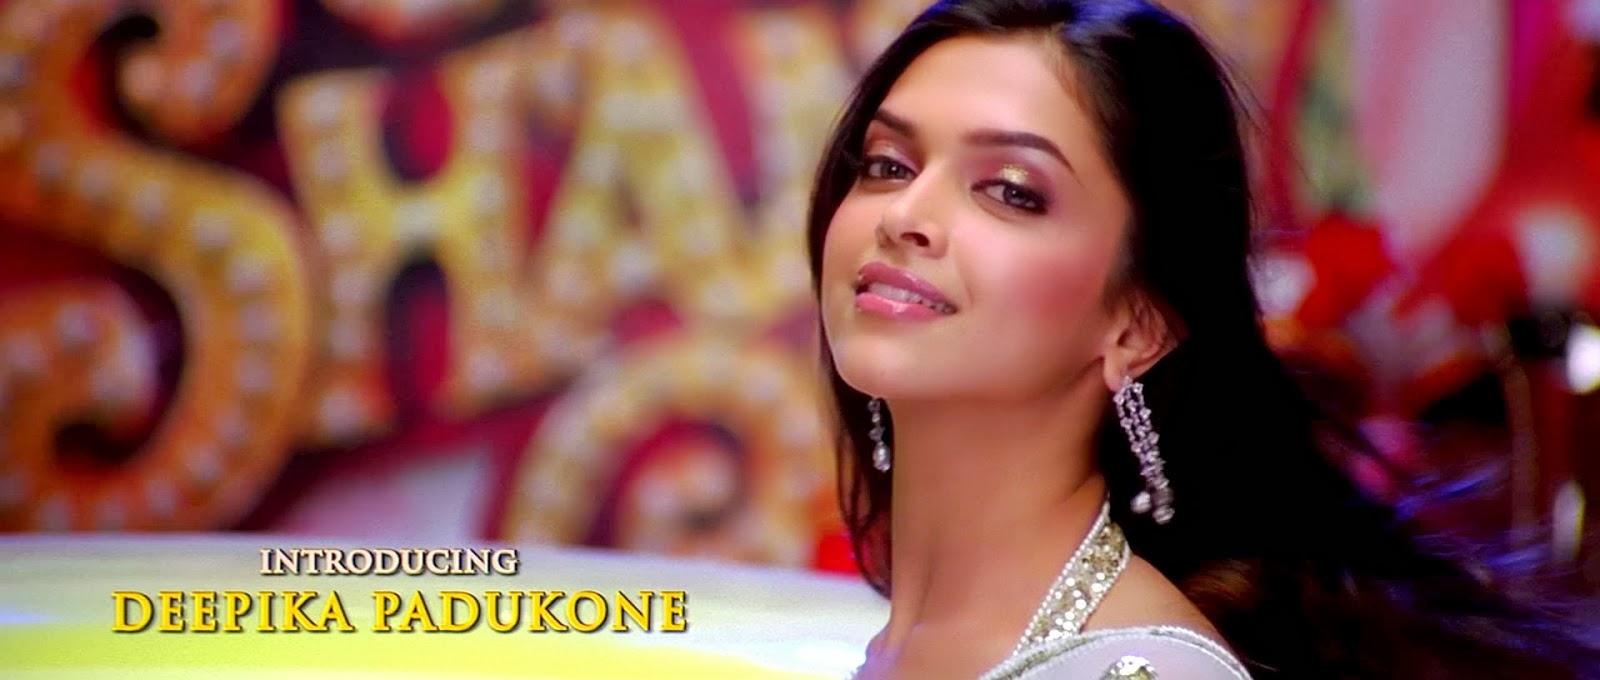 Om Shanti Om.All Songs.2007.BluRay.1080P.DTS-HDMA.PRITAM- Exclusive - Multi-Links